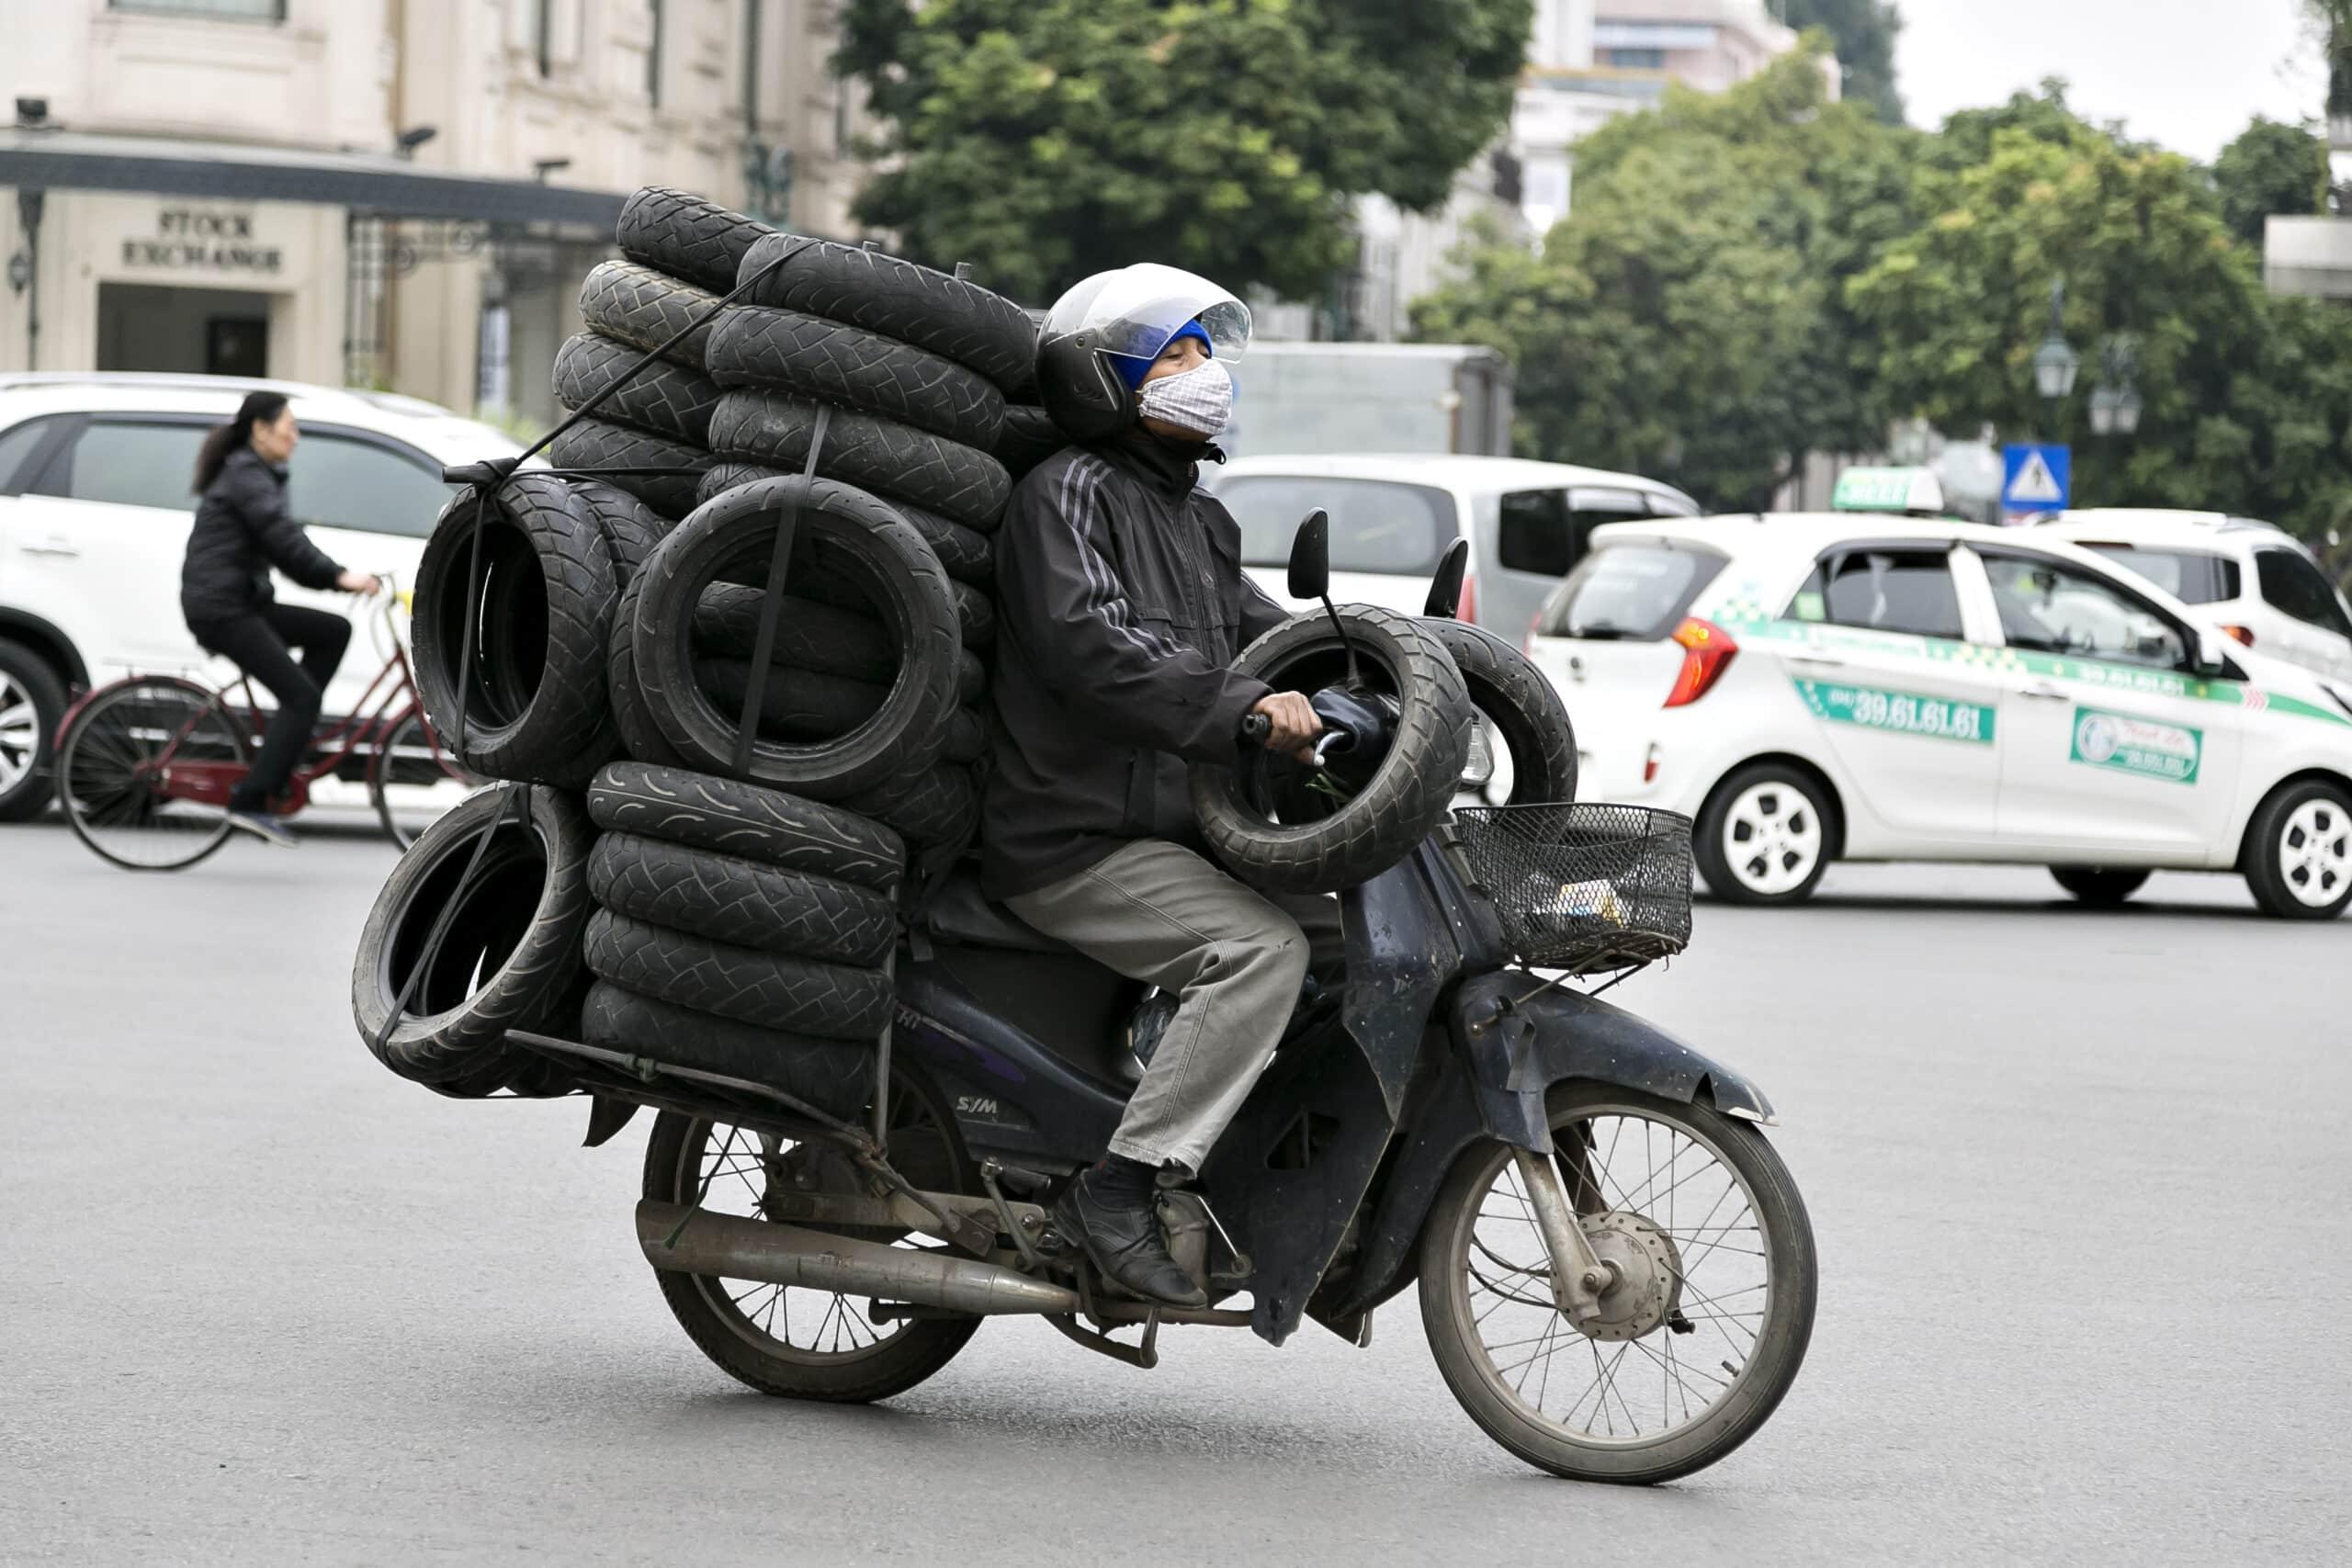 Hanoi i Vietnam, transport på knallert, Genrebilleder. Erhvervsbilleder, erhvervsfoto, hjemmeside, markedsføring,